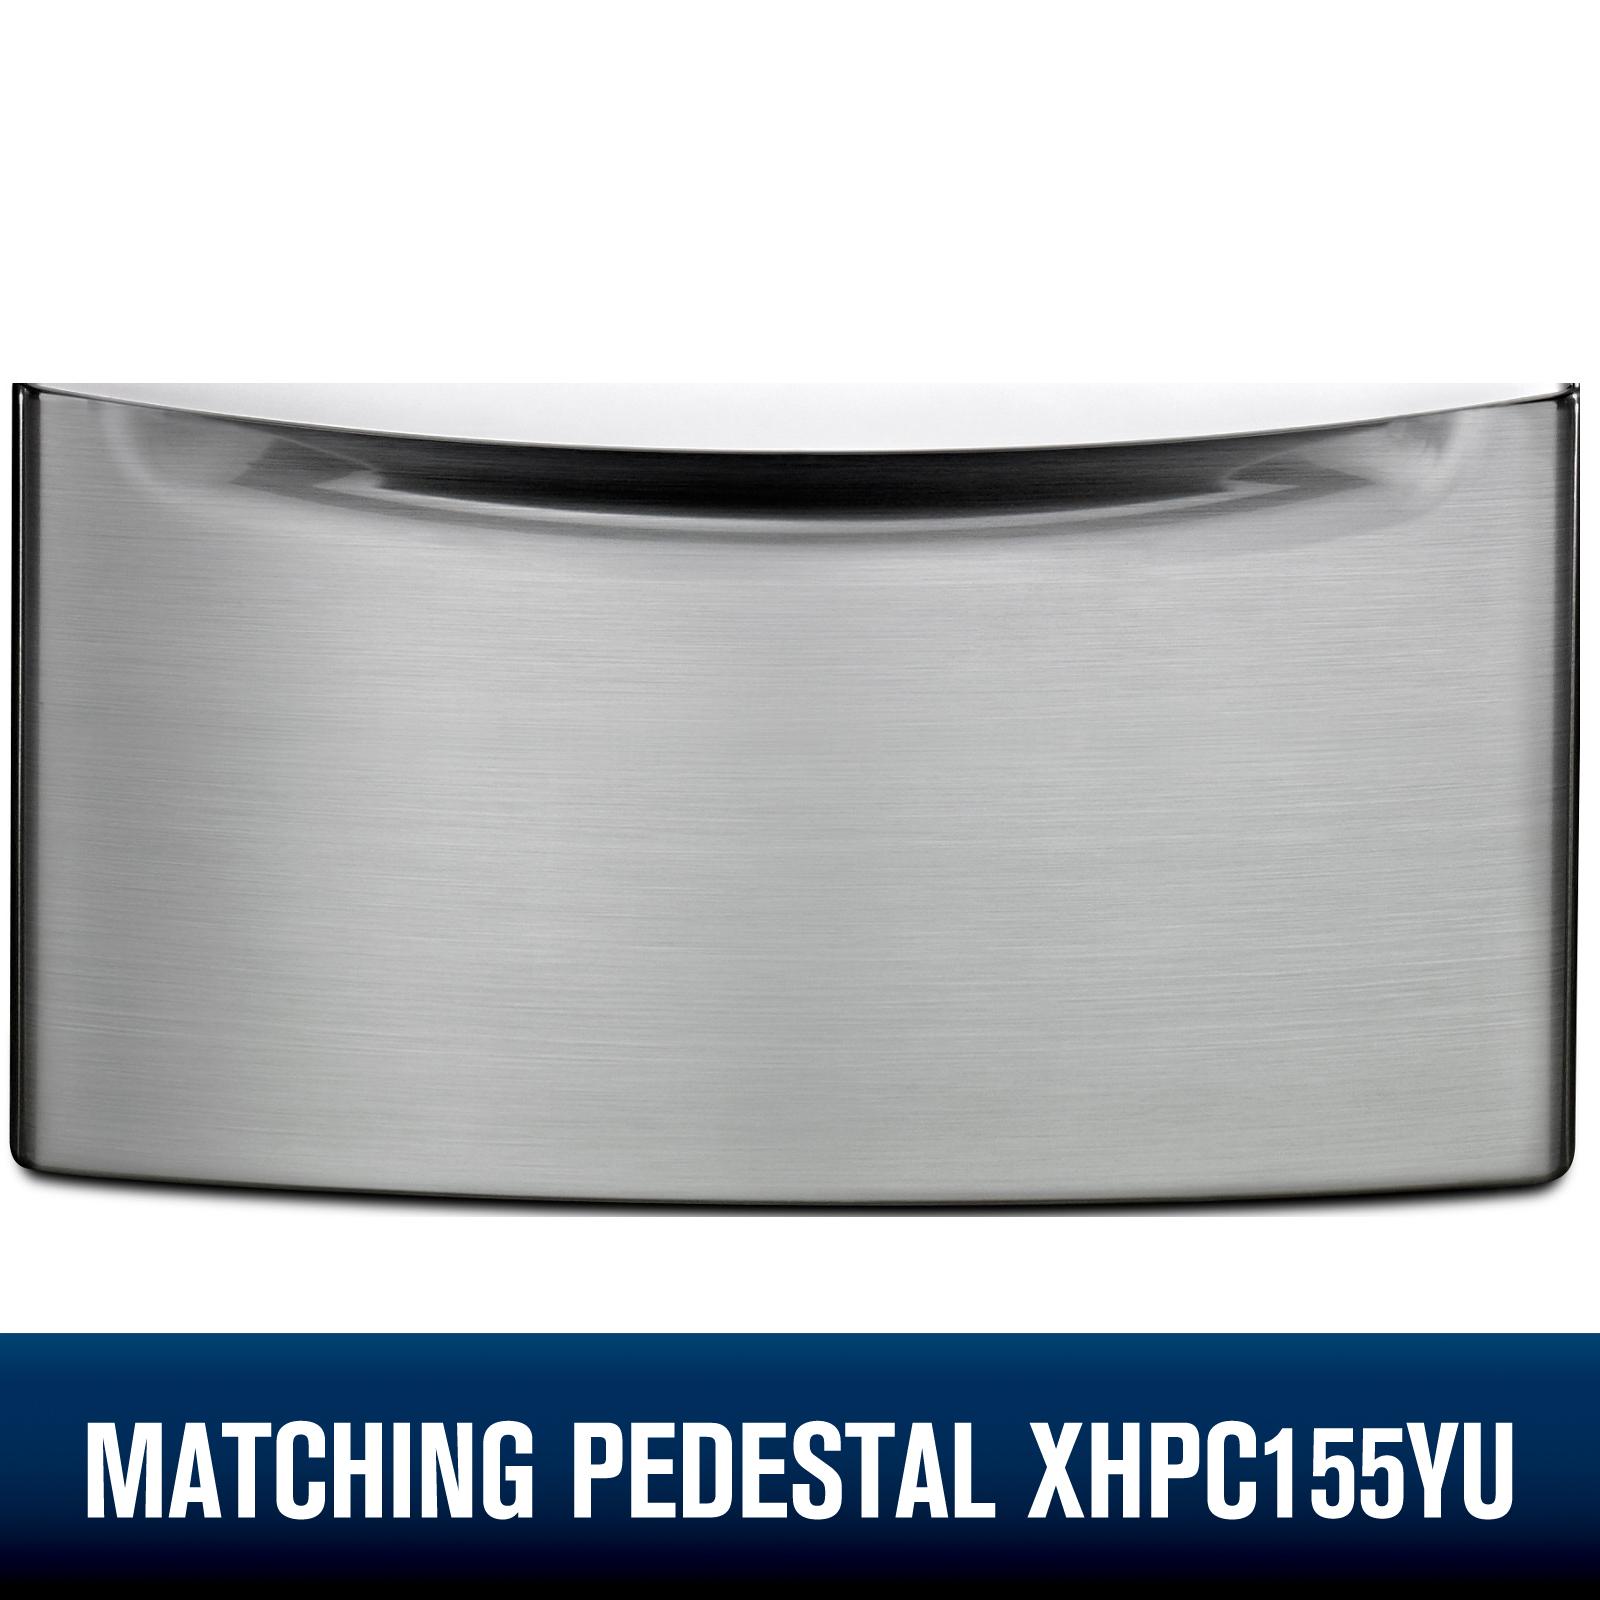 Whirlpool WFW92HEFU  4.5 cu. ft. Front Load Washer w/ Load & Go™ Bulk Dispenser - Diamond Steel